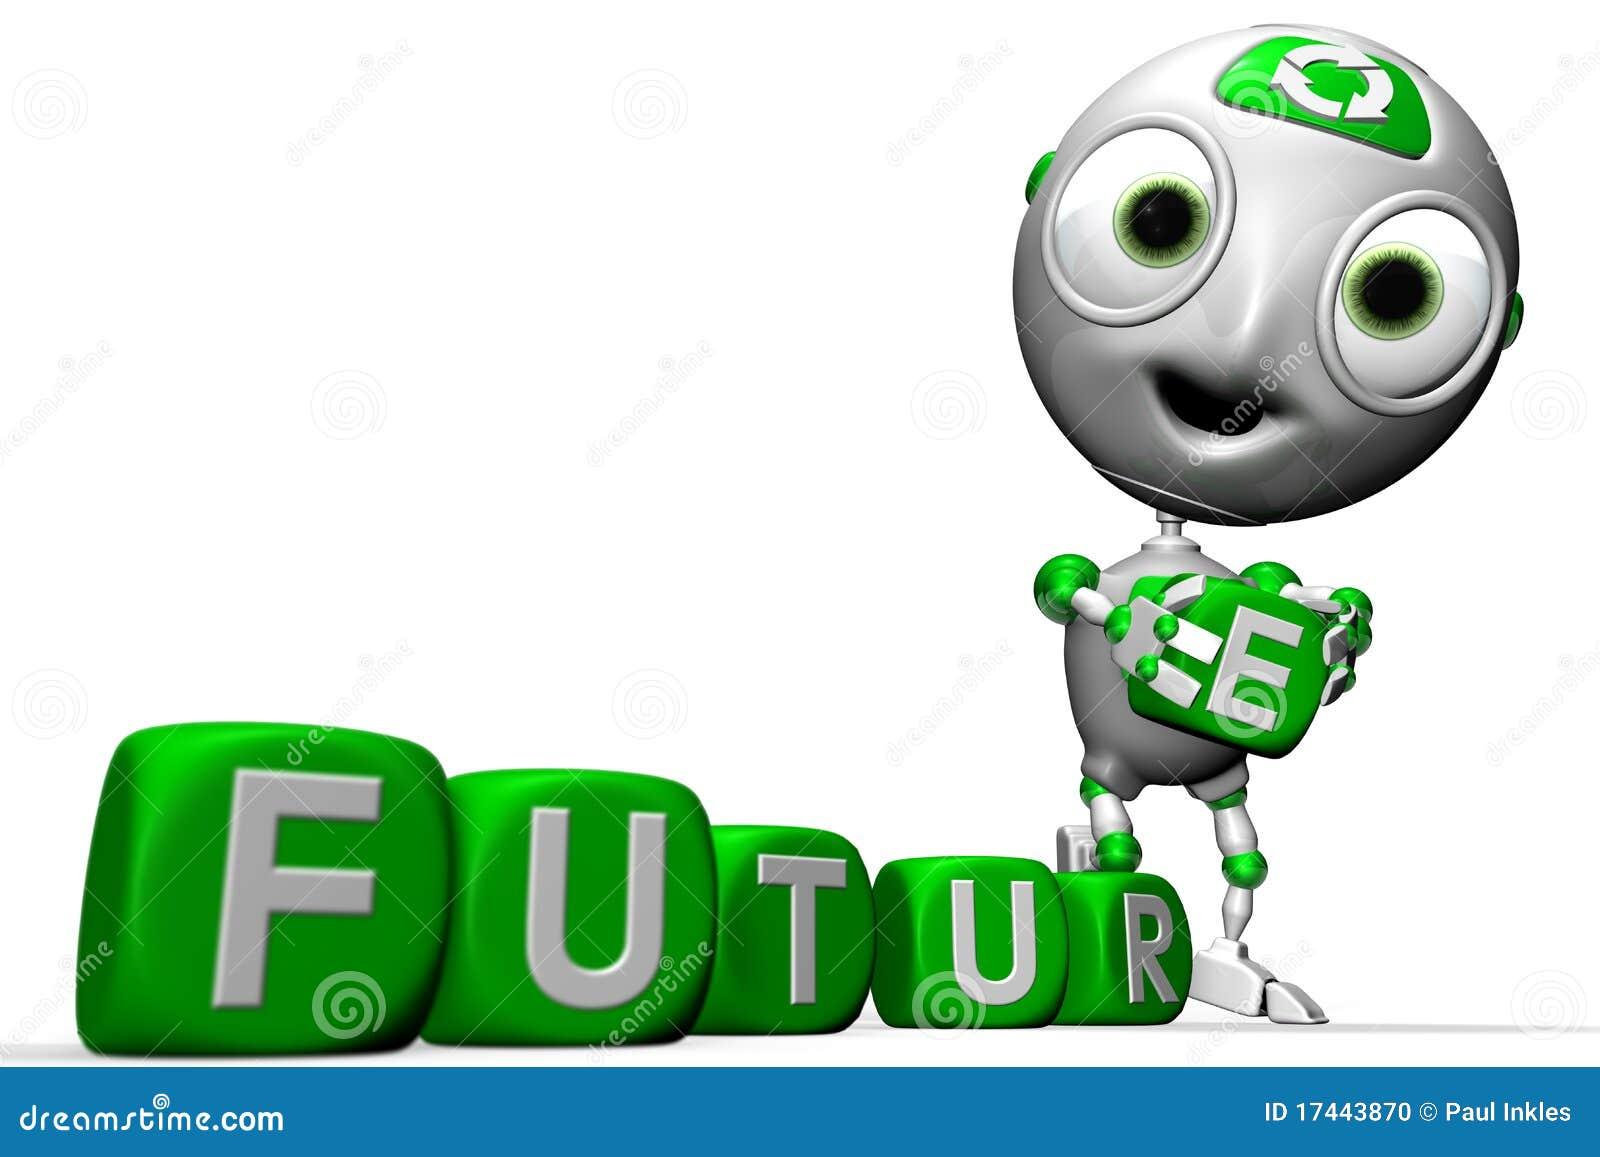 Envirobot and a Greener future